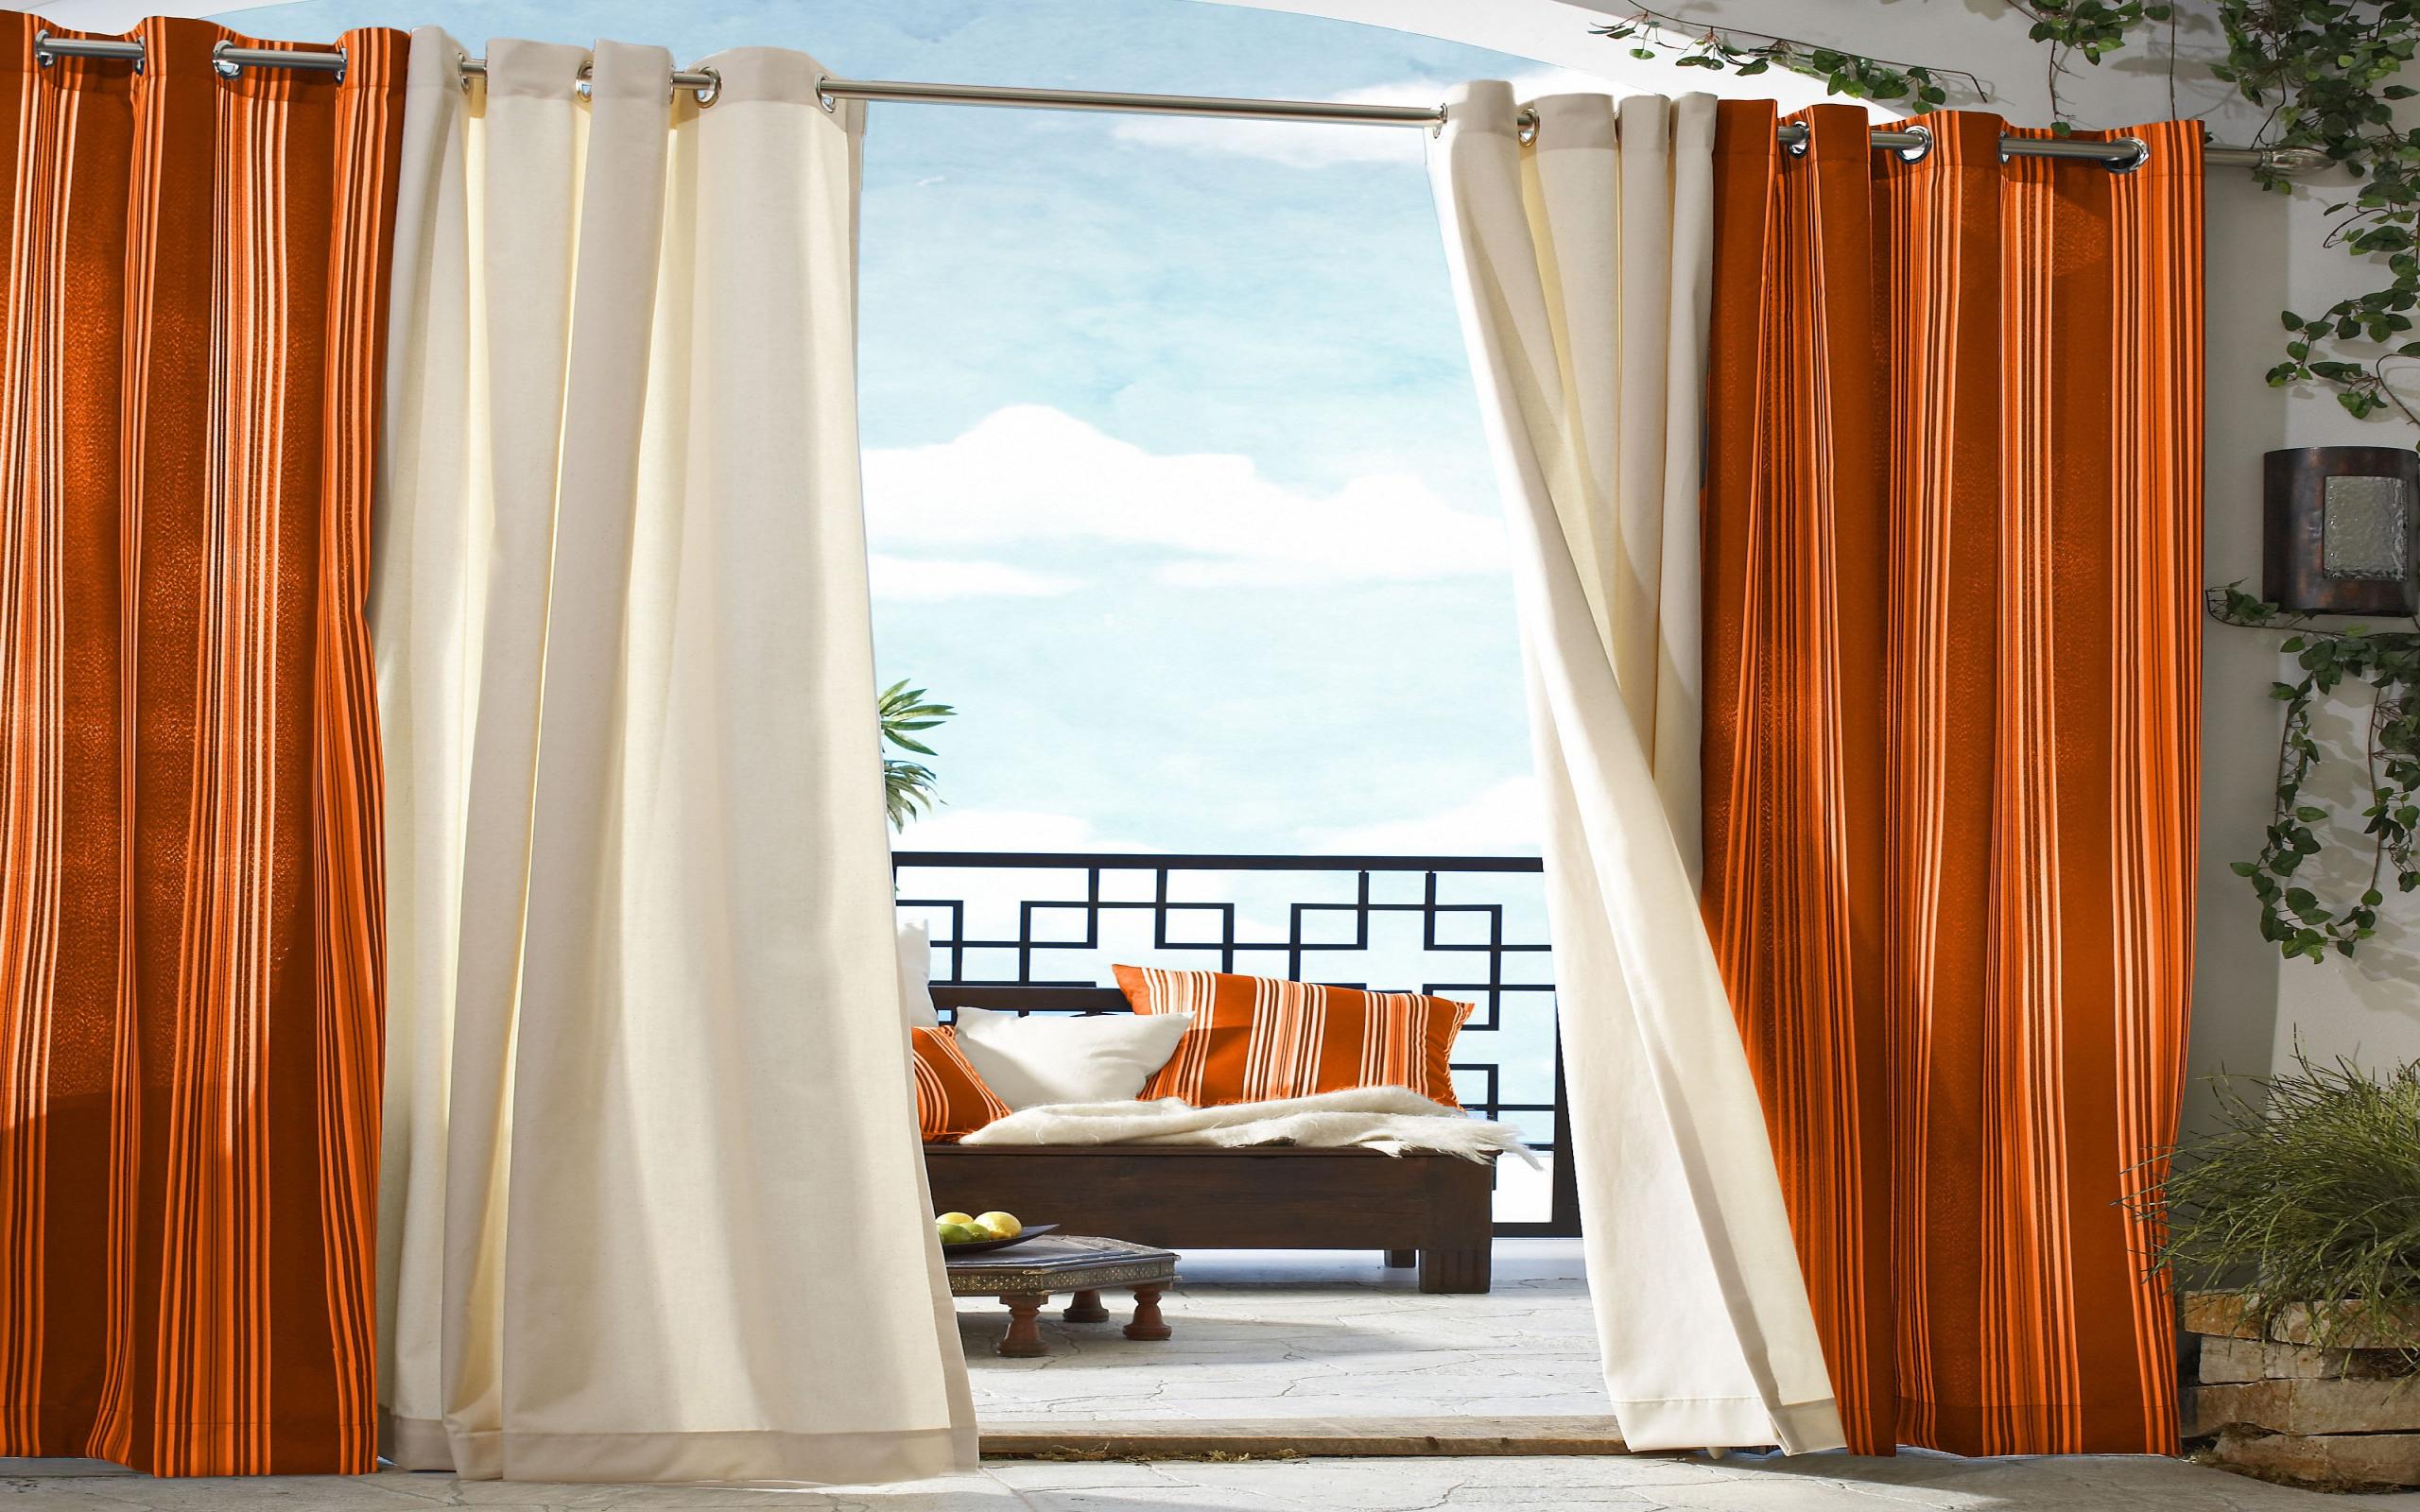 Inspirasi langsir putih dan chrome sesuai untuk tirai balkoni